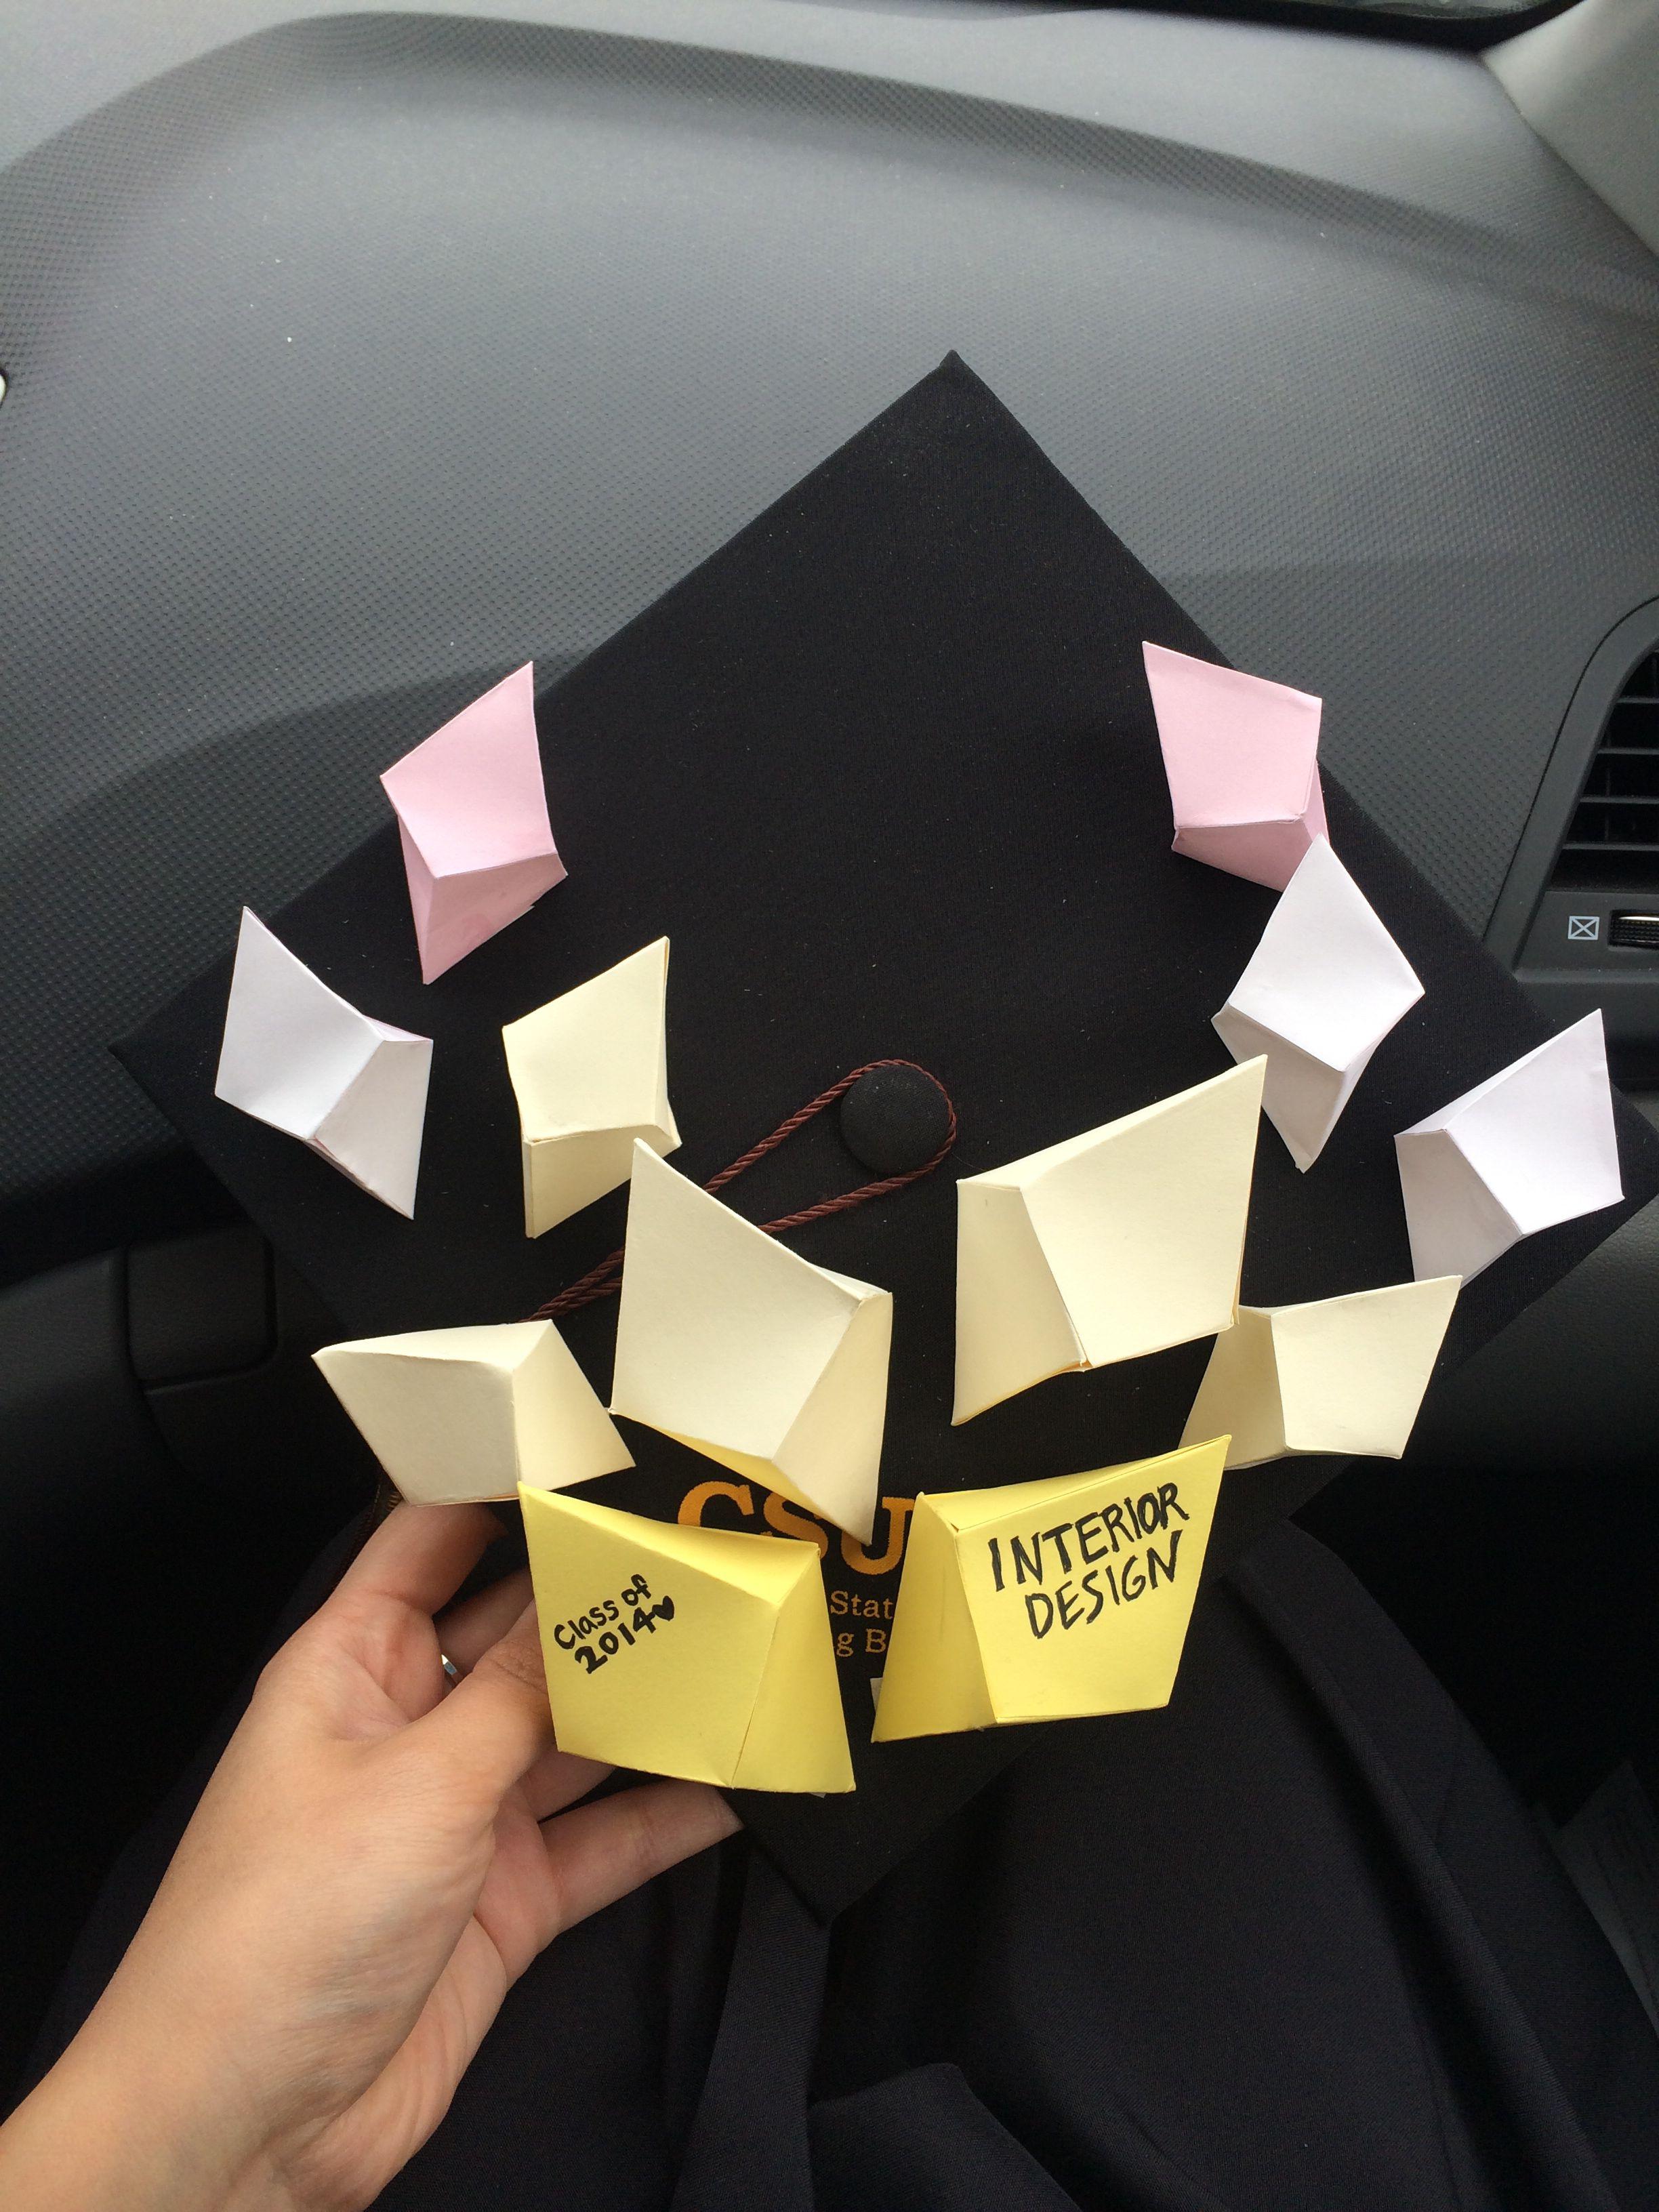 Interior Design Major Graduation Cap Decoration With Geometric